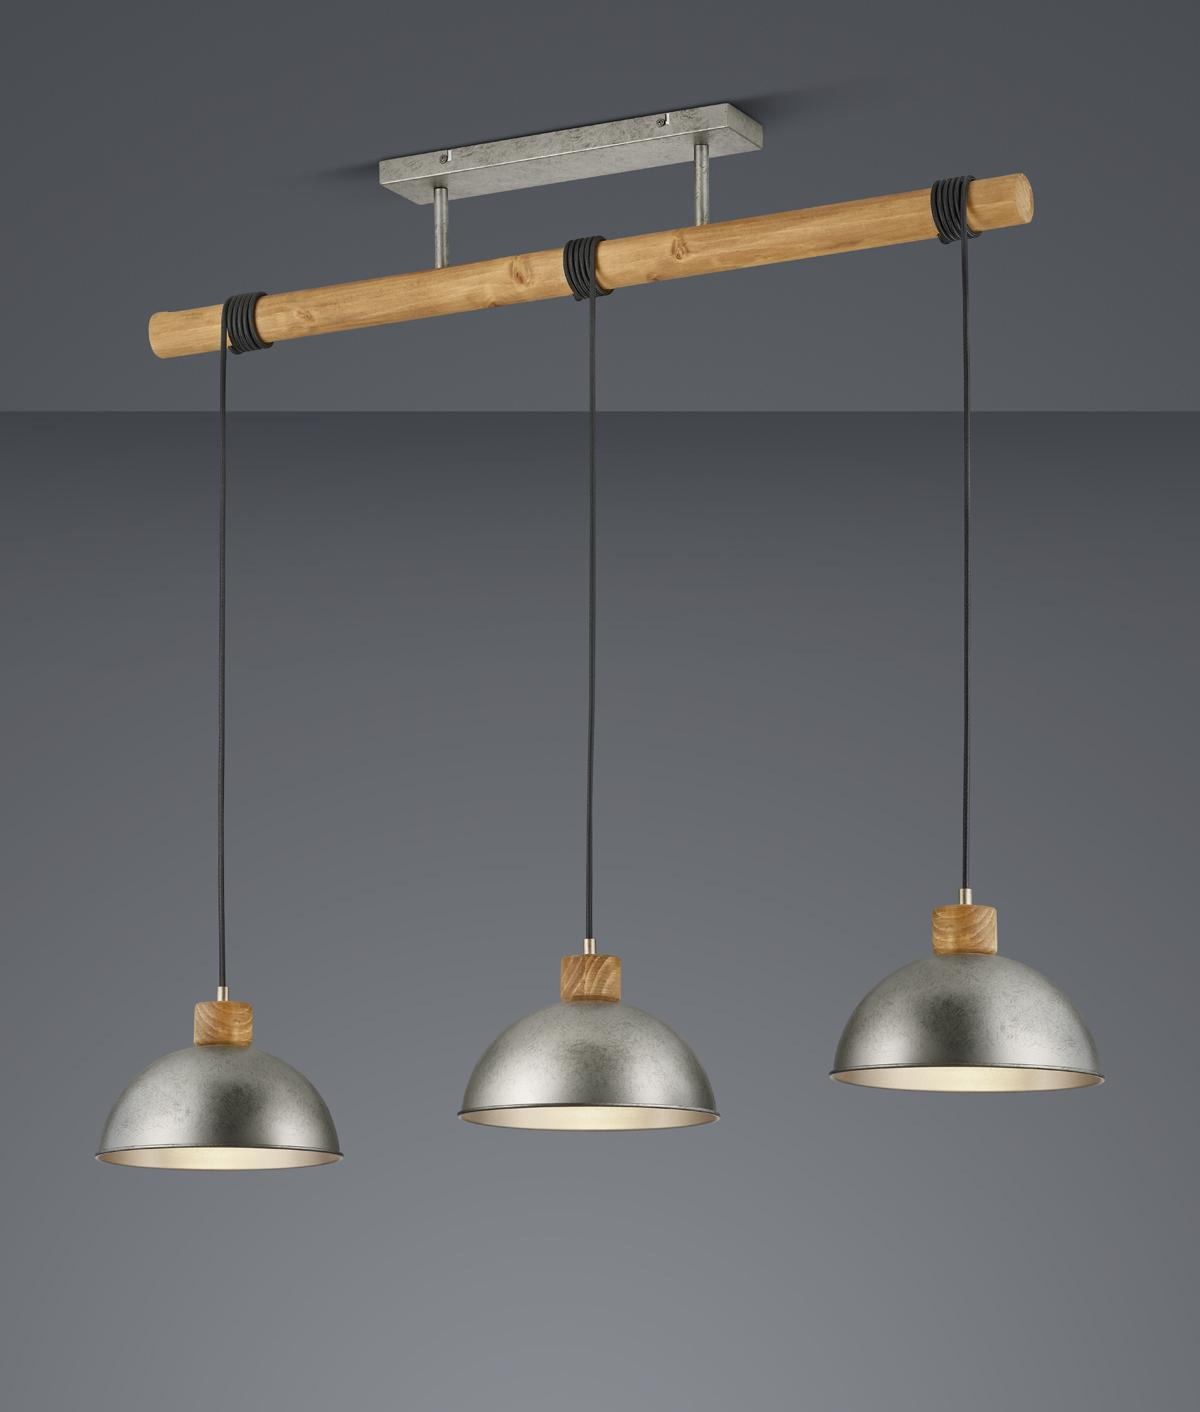 Pendelleuchte, Industriestil, Metall, Holzoptik, 3-flammig, Nickel